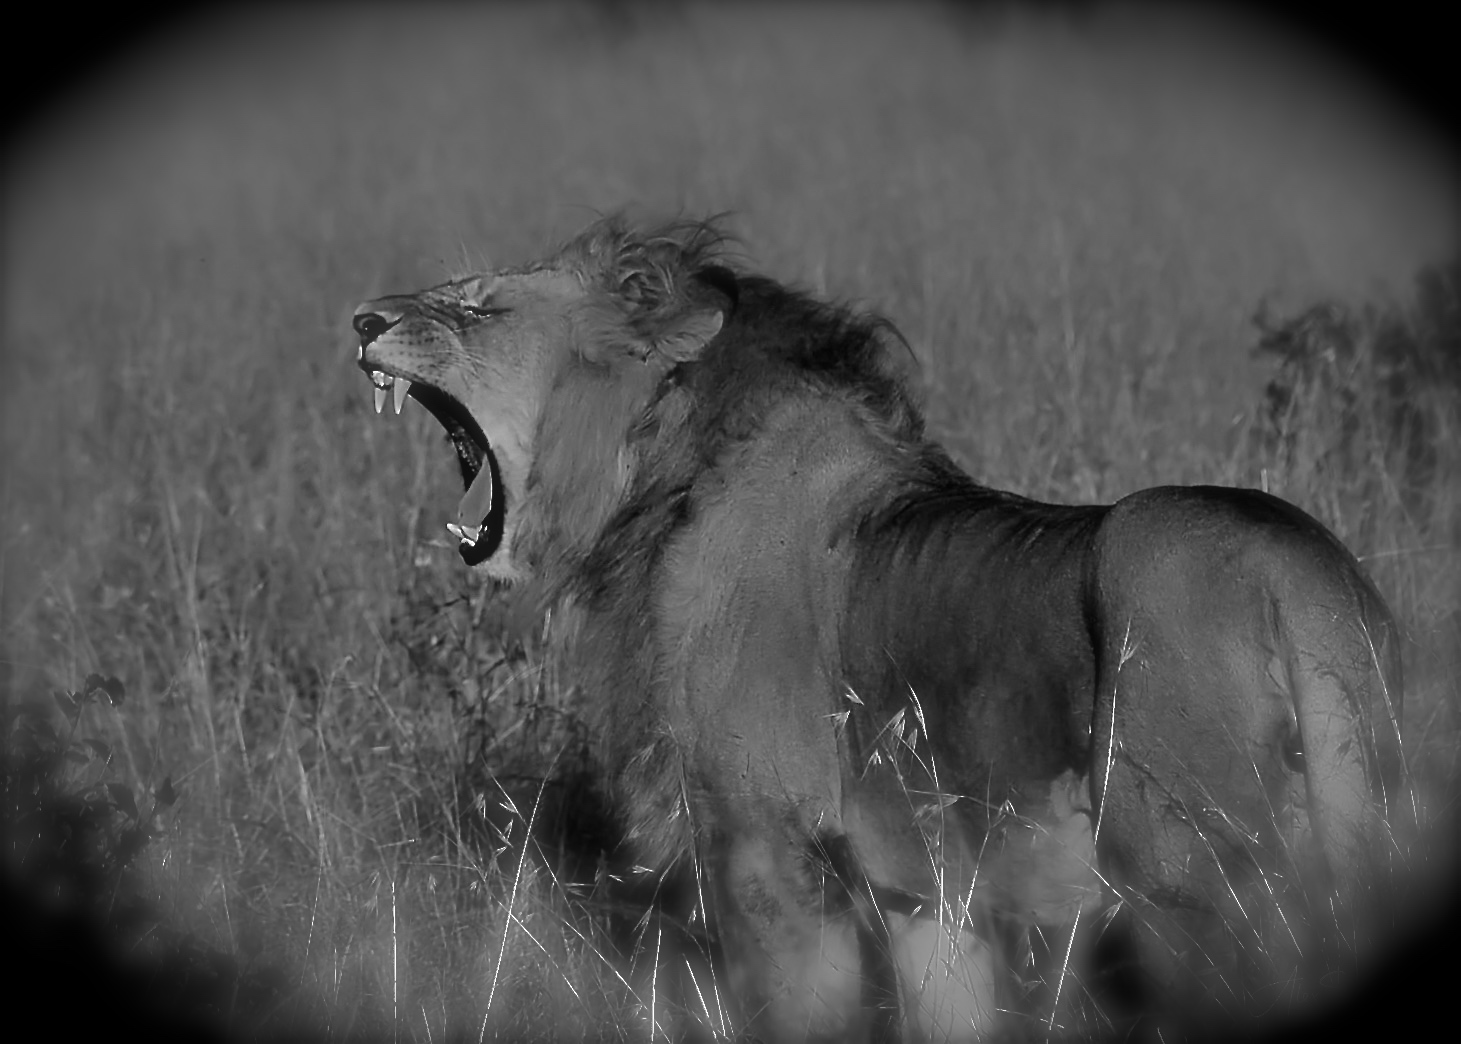 ©Alex Strachan - Maasai Mara National Reserve, Kenya